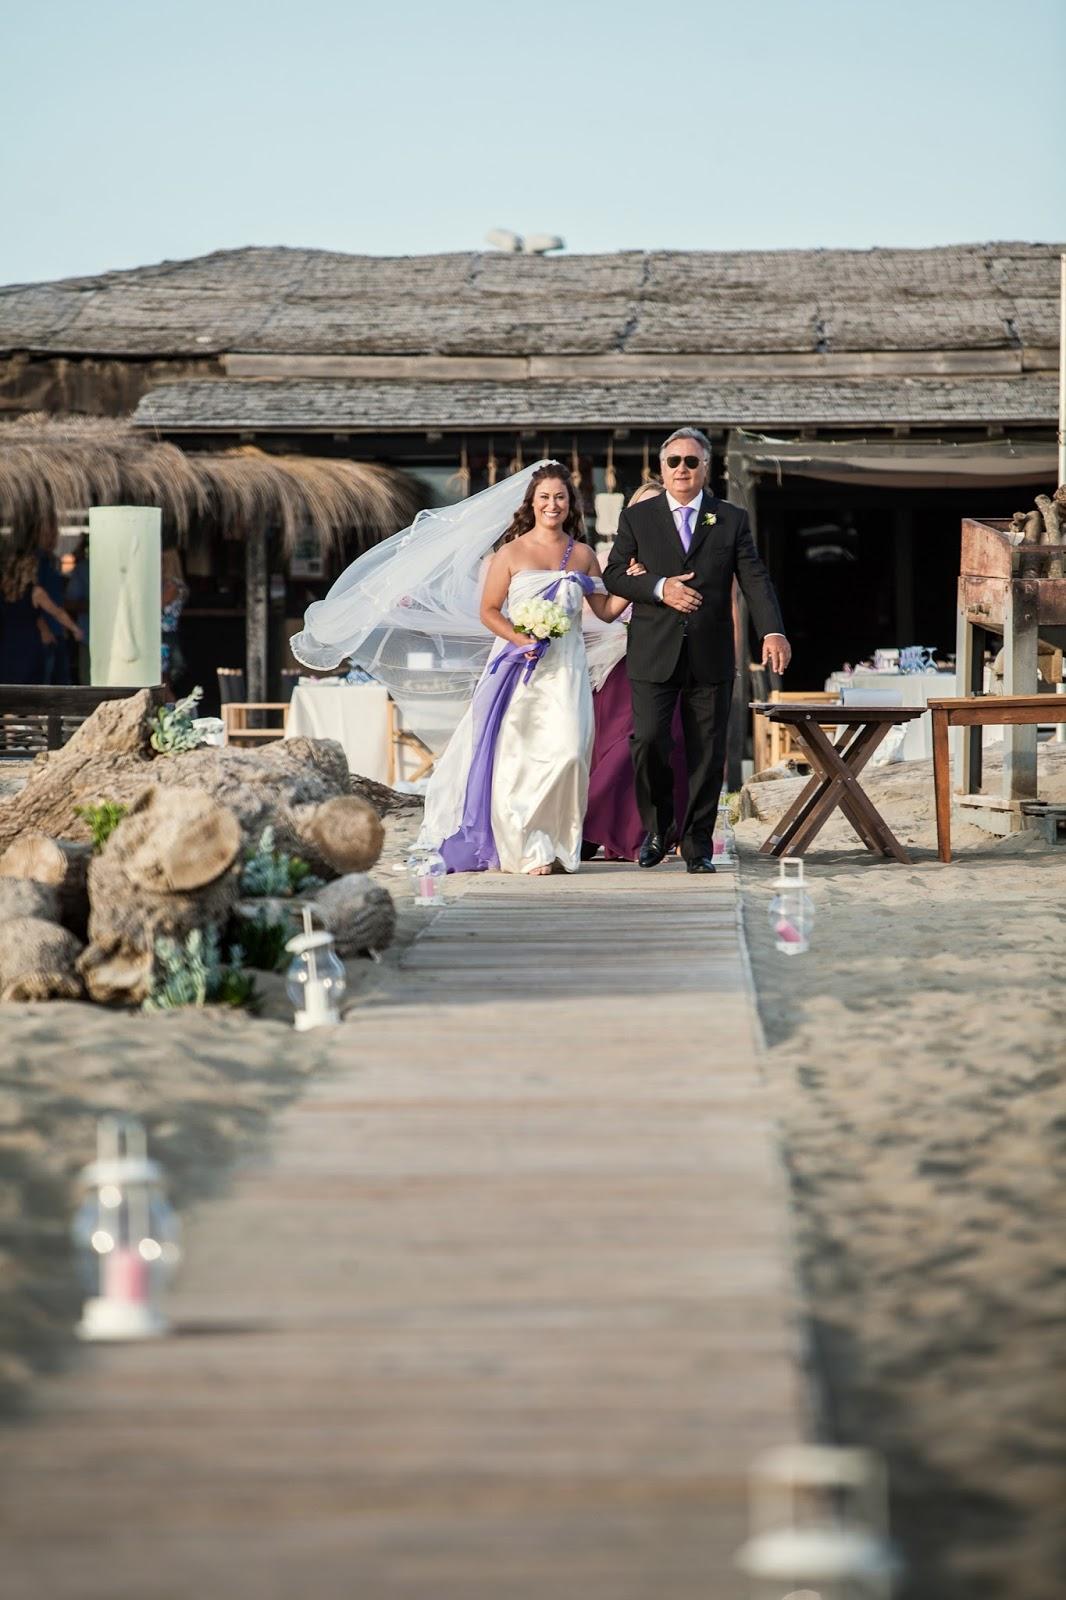 Matrimonio Spiaggia Uomo : Matrimonio in spiaggia